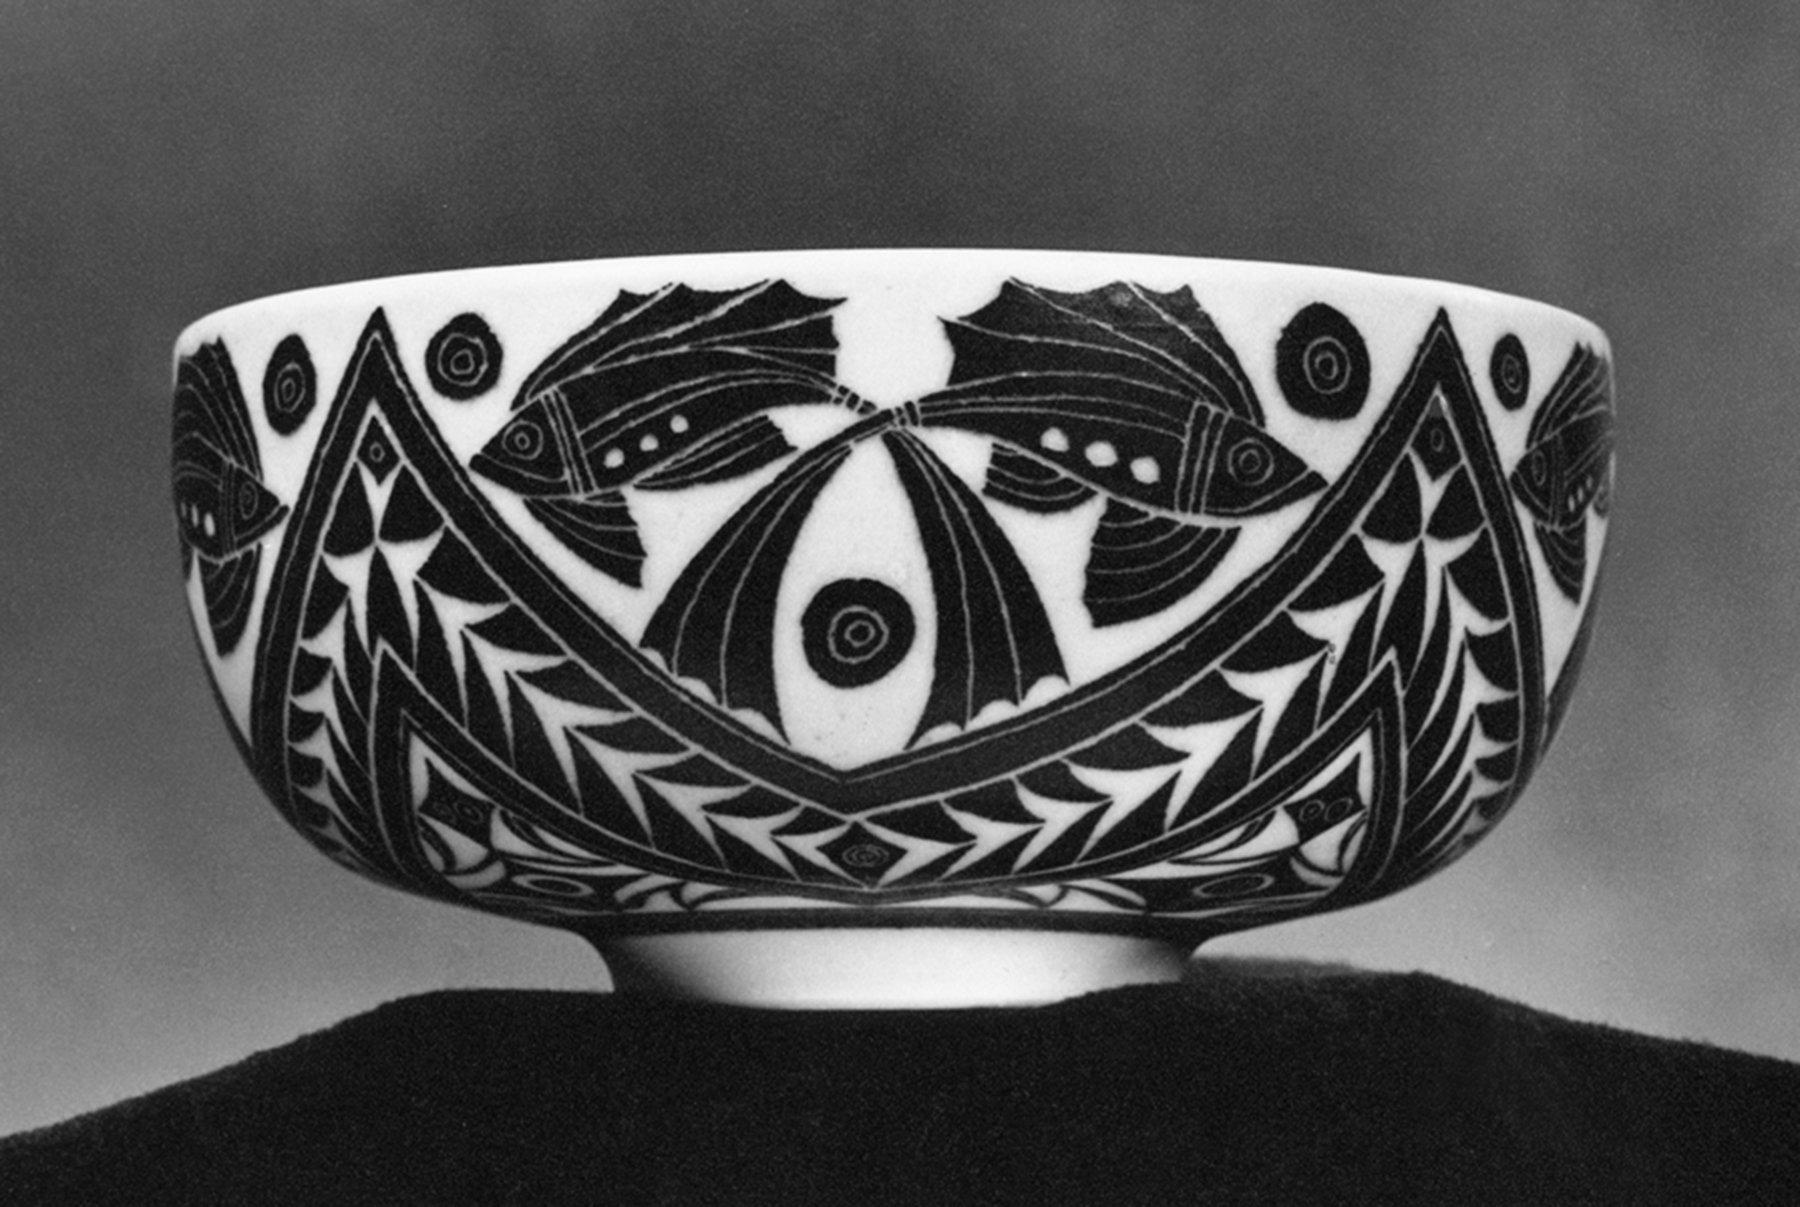 porcelain bowl with fish design